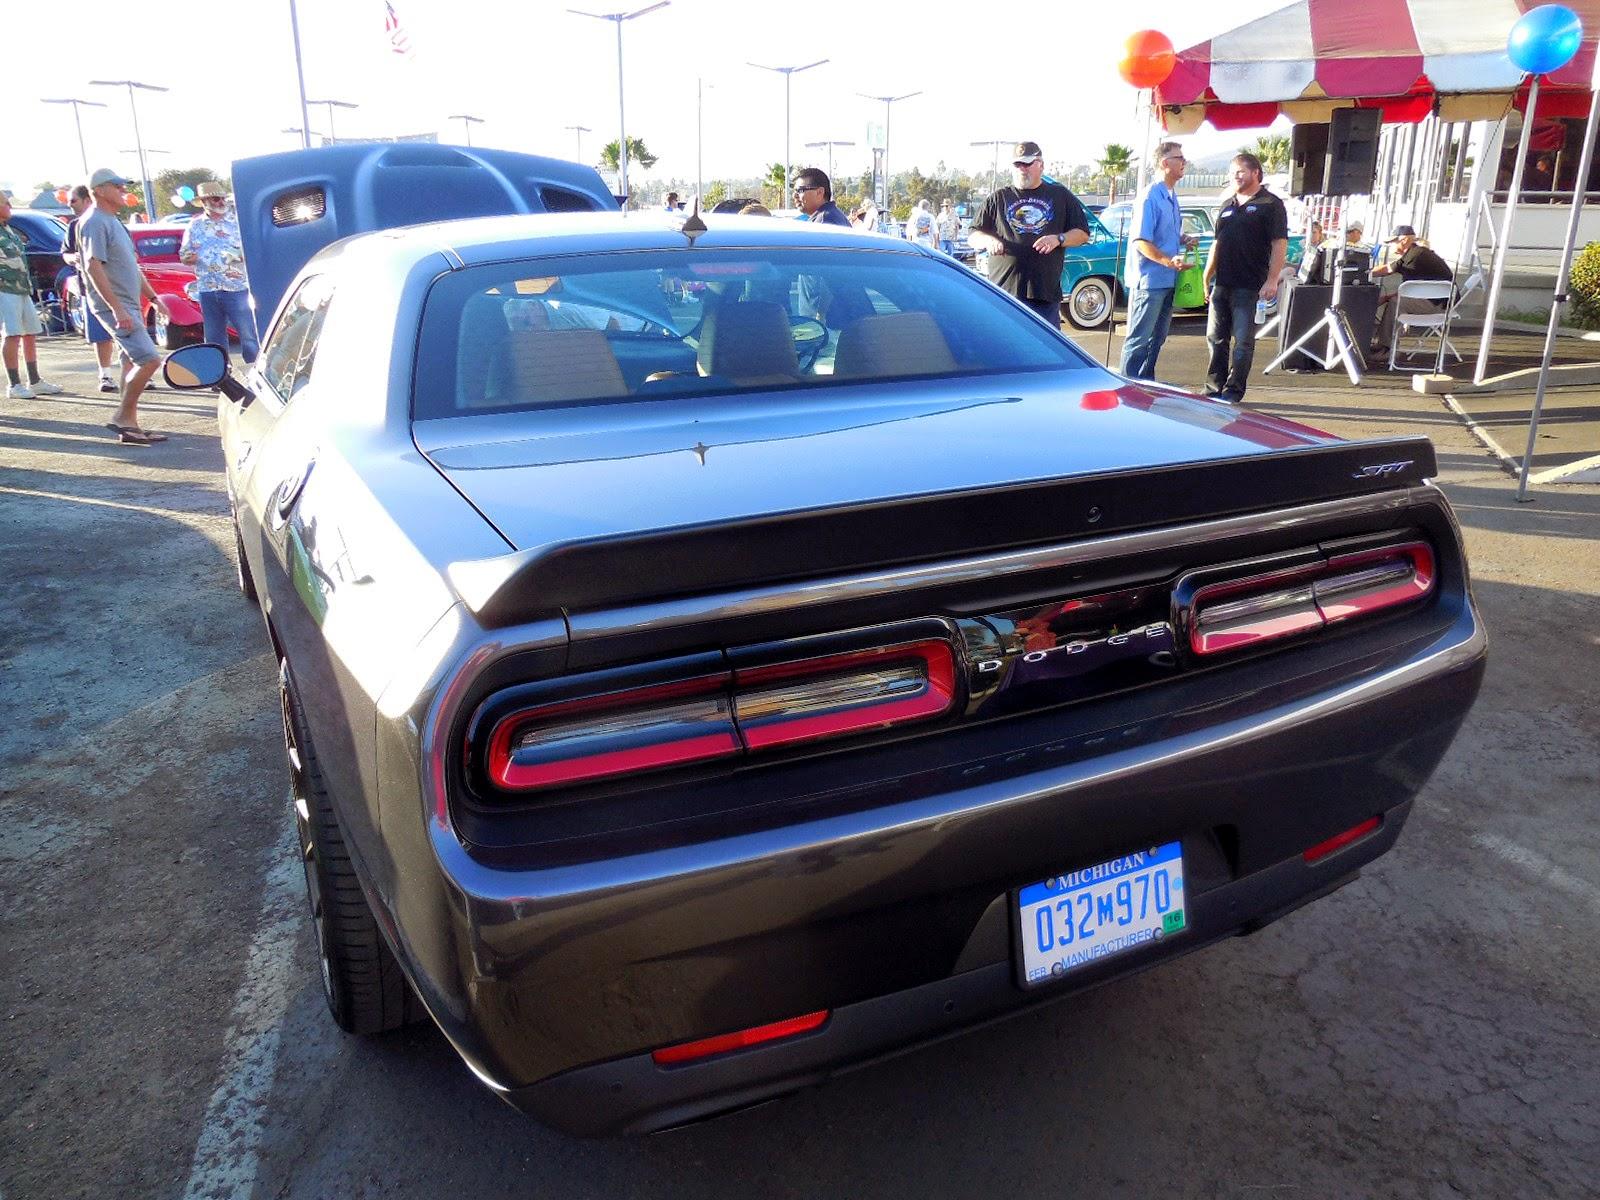 Carl Burger Dodge San Diego >> Just A Car Guy: Carl Burger Dodge, the biggest San Diego Mopar dealership, had it's annual ...